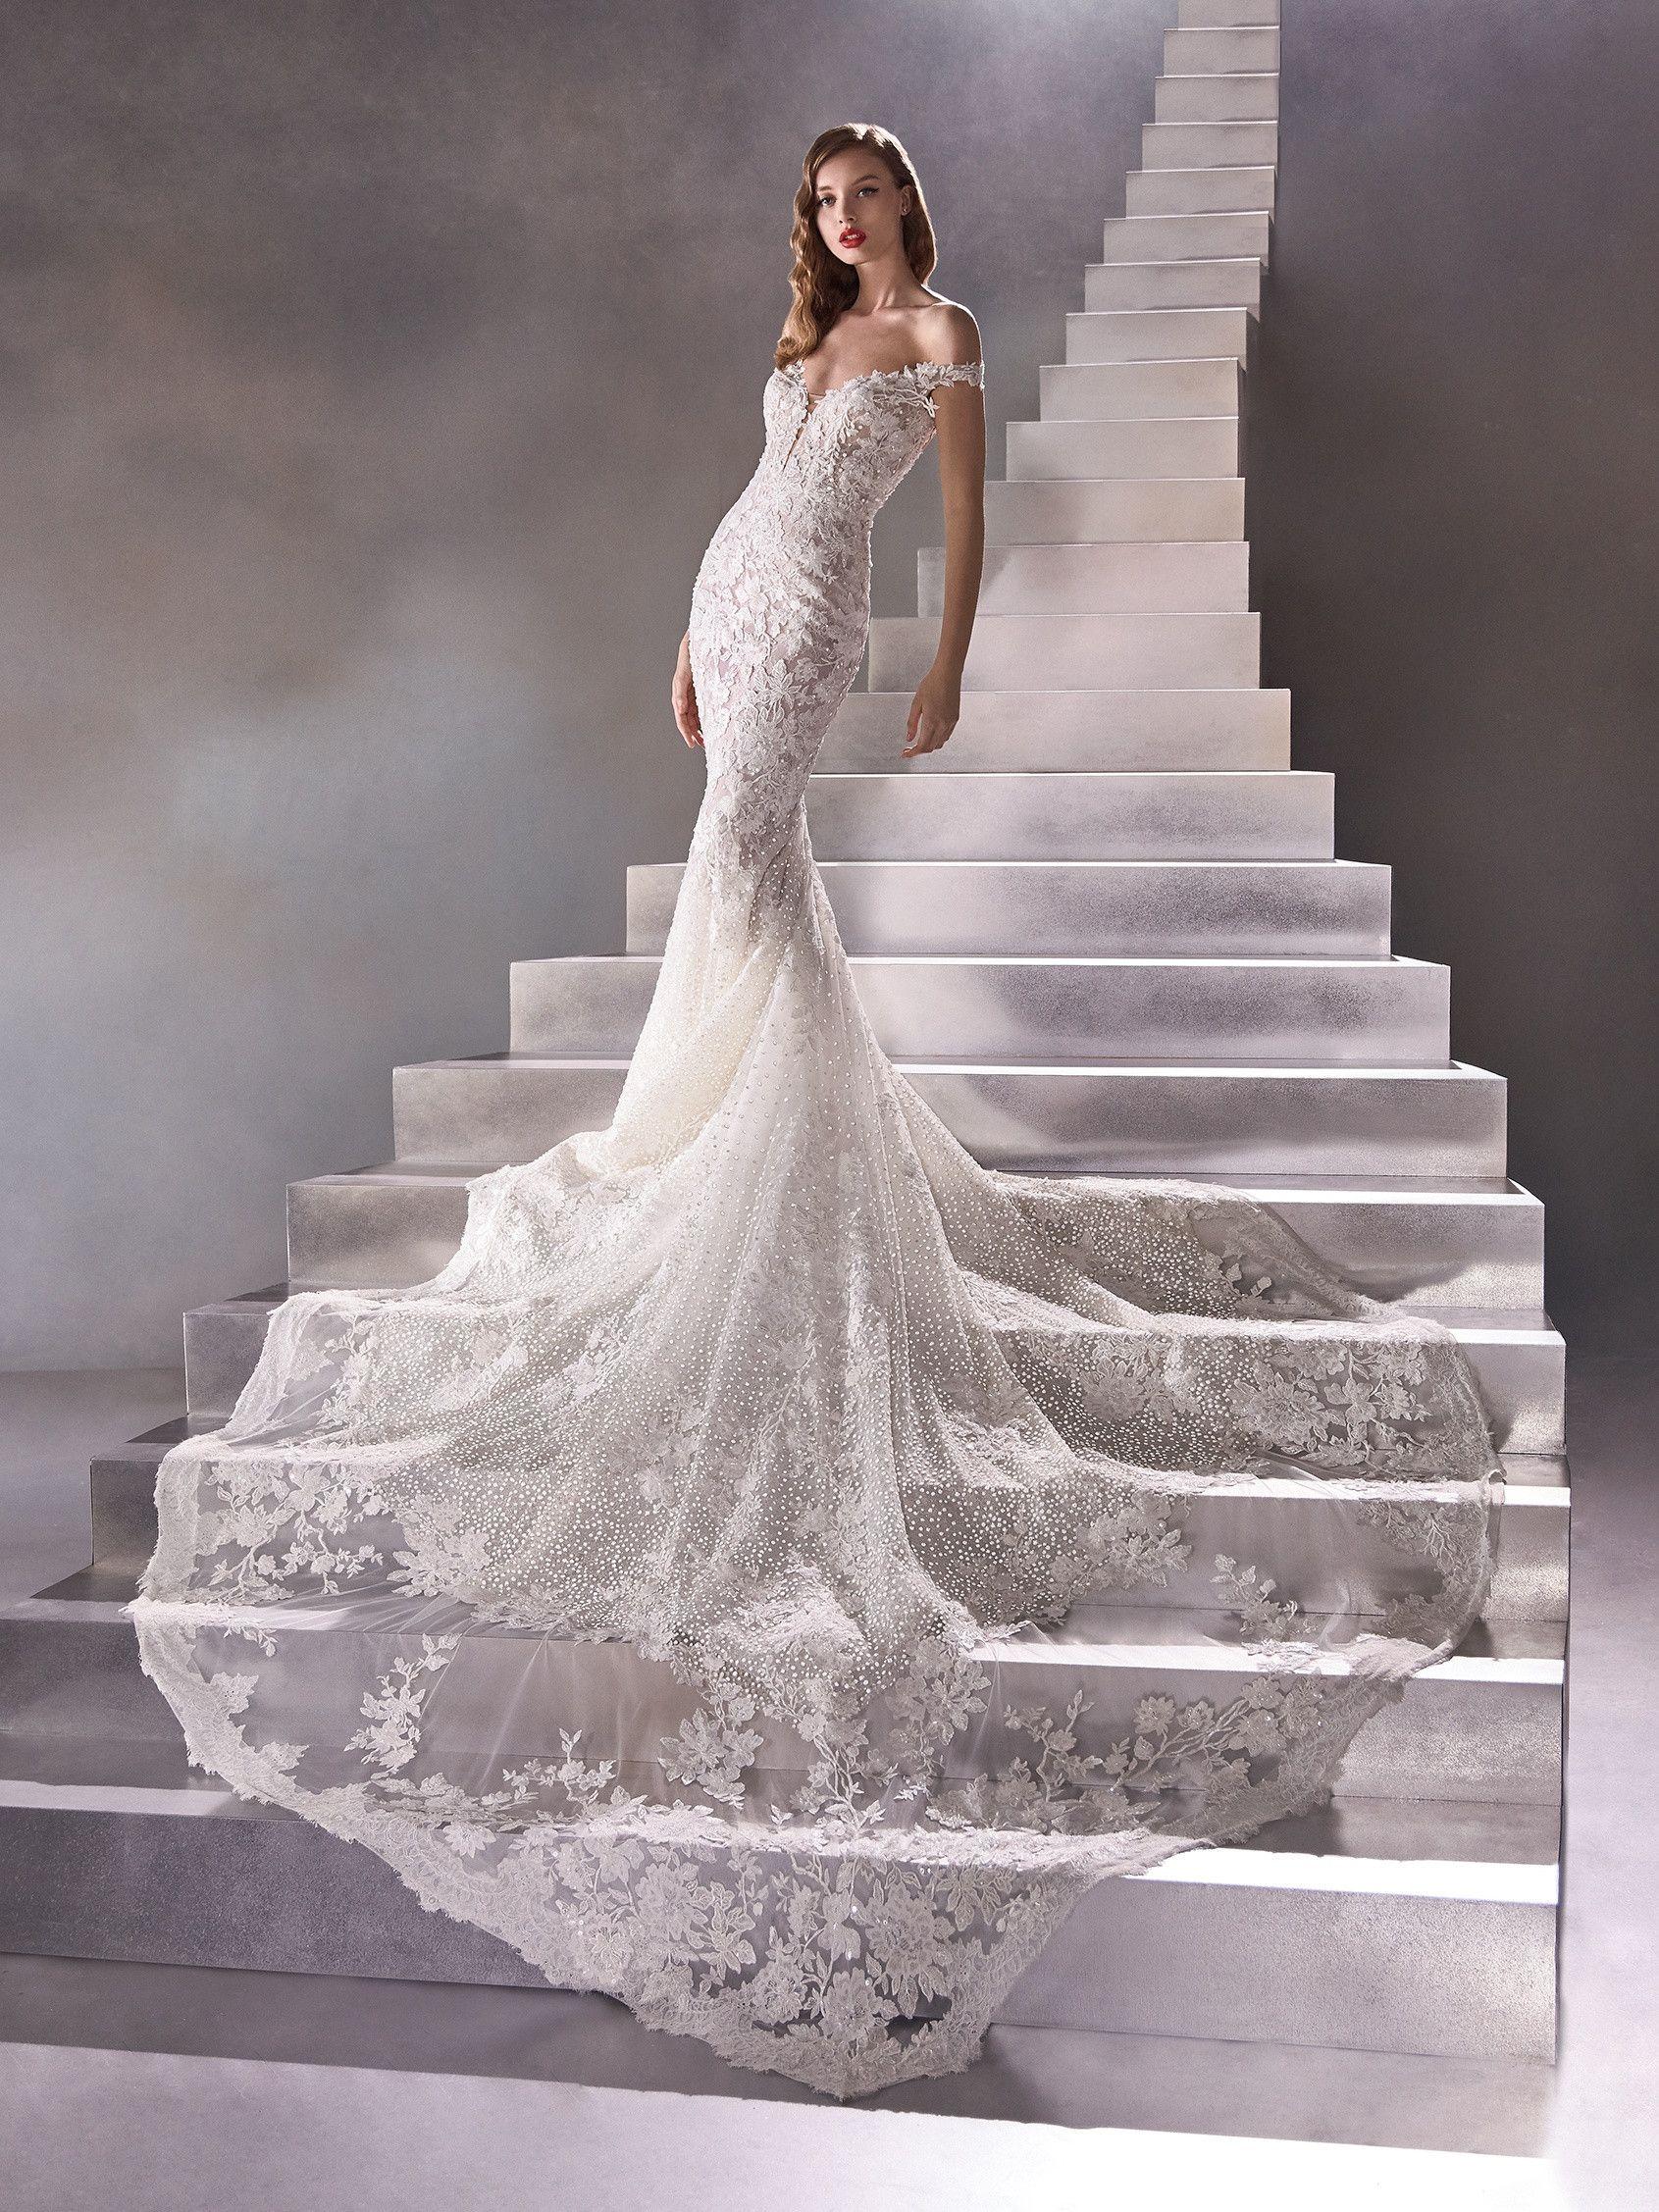 Asteroid In 2020 Pronovias Wedding Dress Wedding Dresses Lace Pronovias Bridal